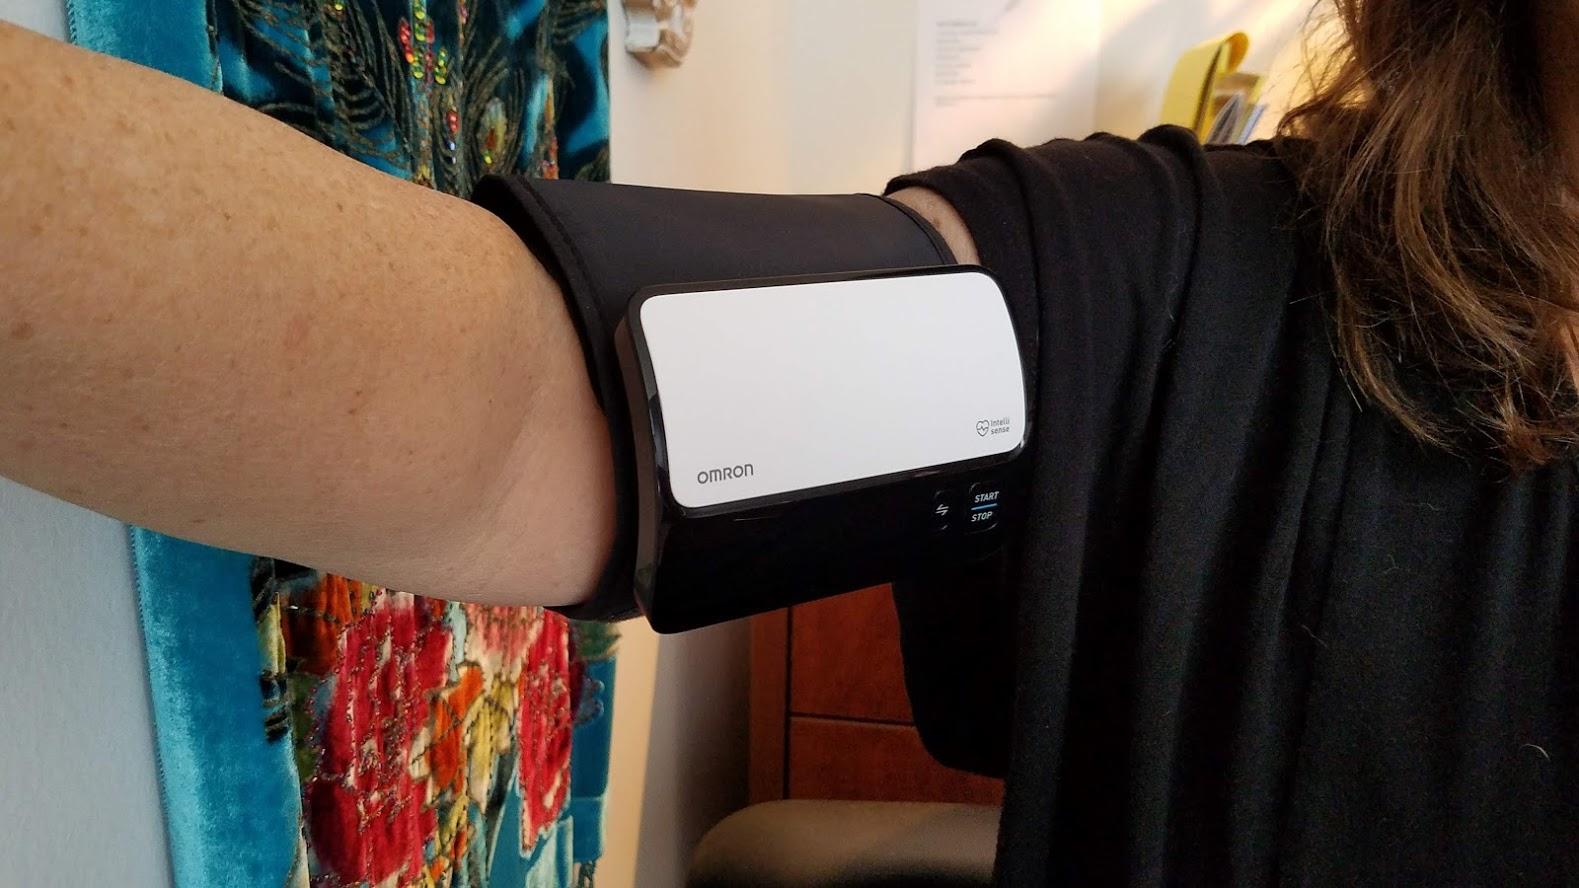 Omron Evolv Wireless Blood Pressure Monitor